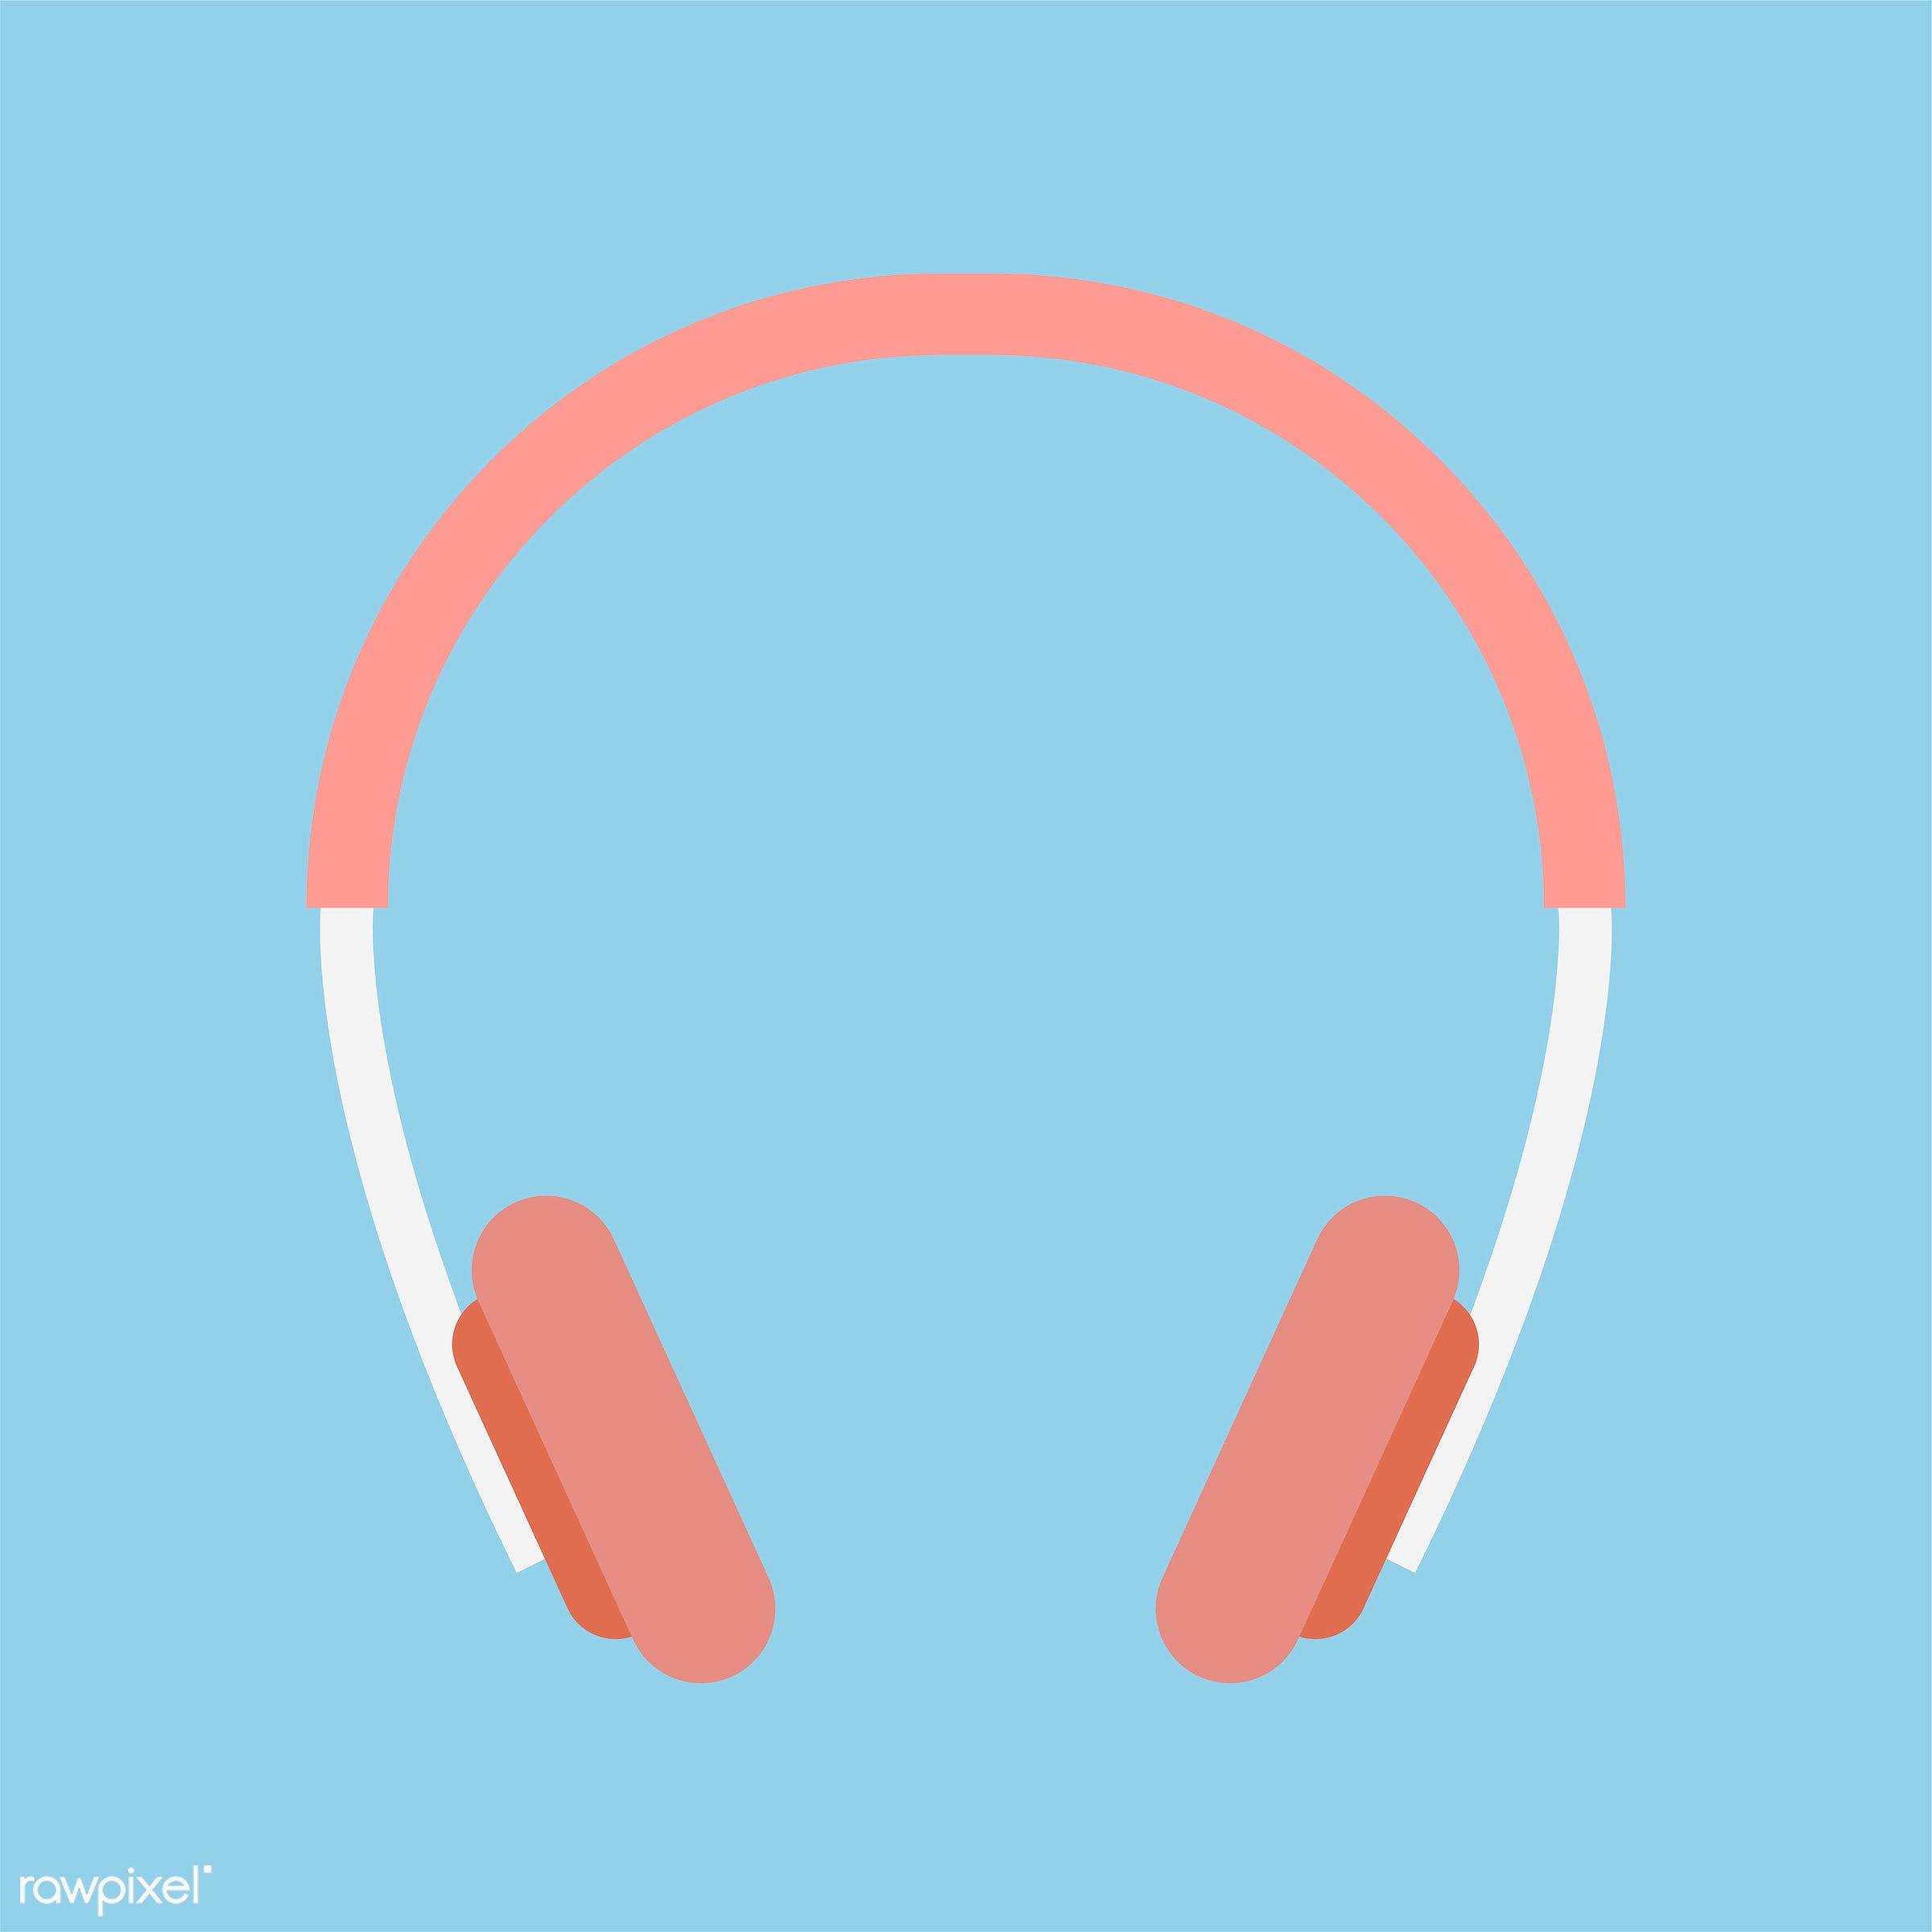 vector, illustration, graphic, music, headphones, earphones, listen, listening, device, wireless, digital, blue, red